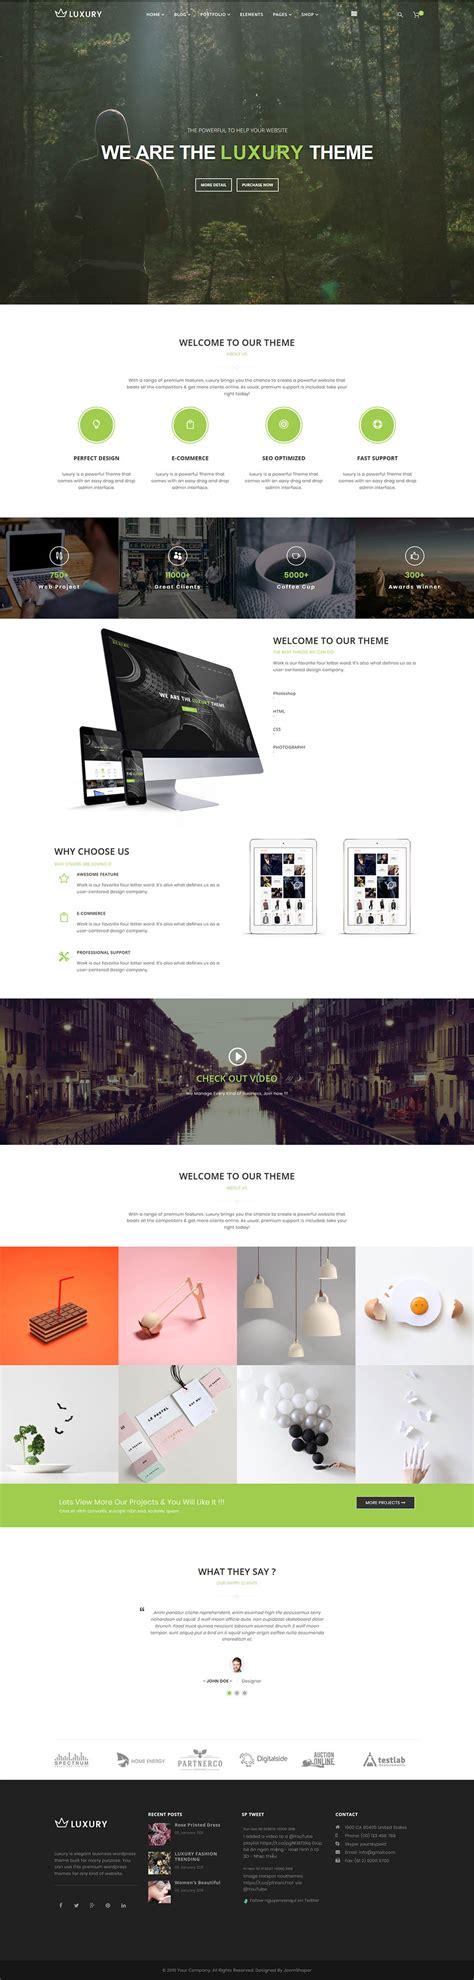 themeforest login template themeforest luxury v1 1 0 18343266 business